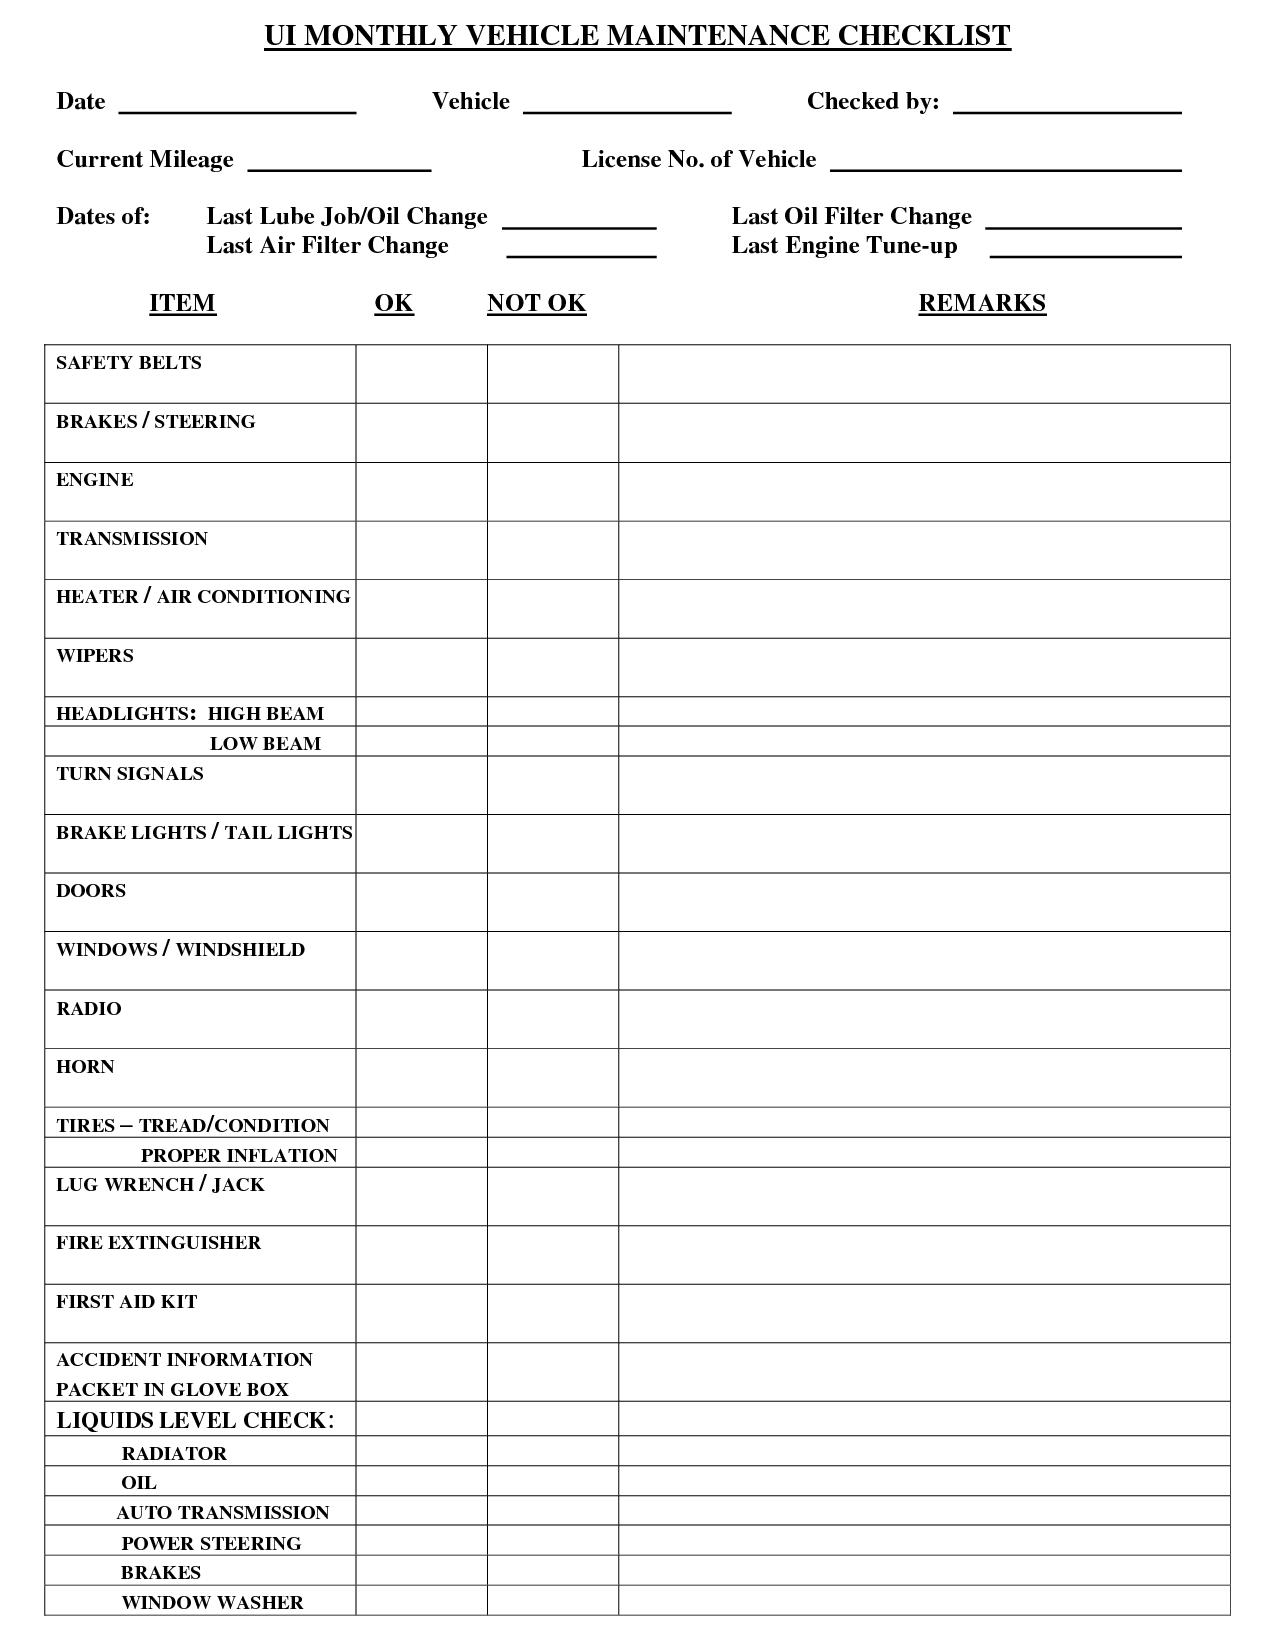 Vehicle Maintenance Checklist Template Lonewolf